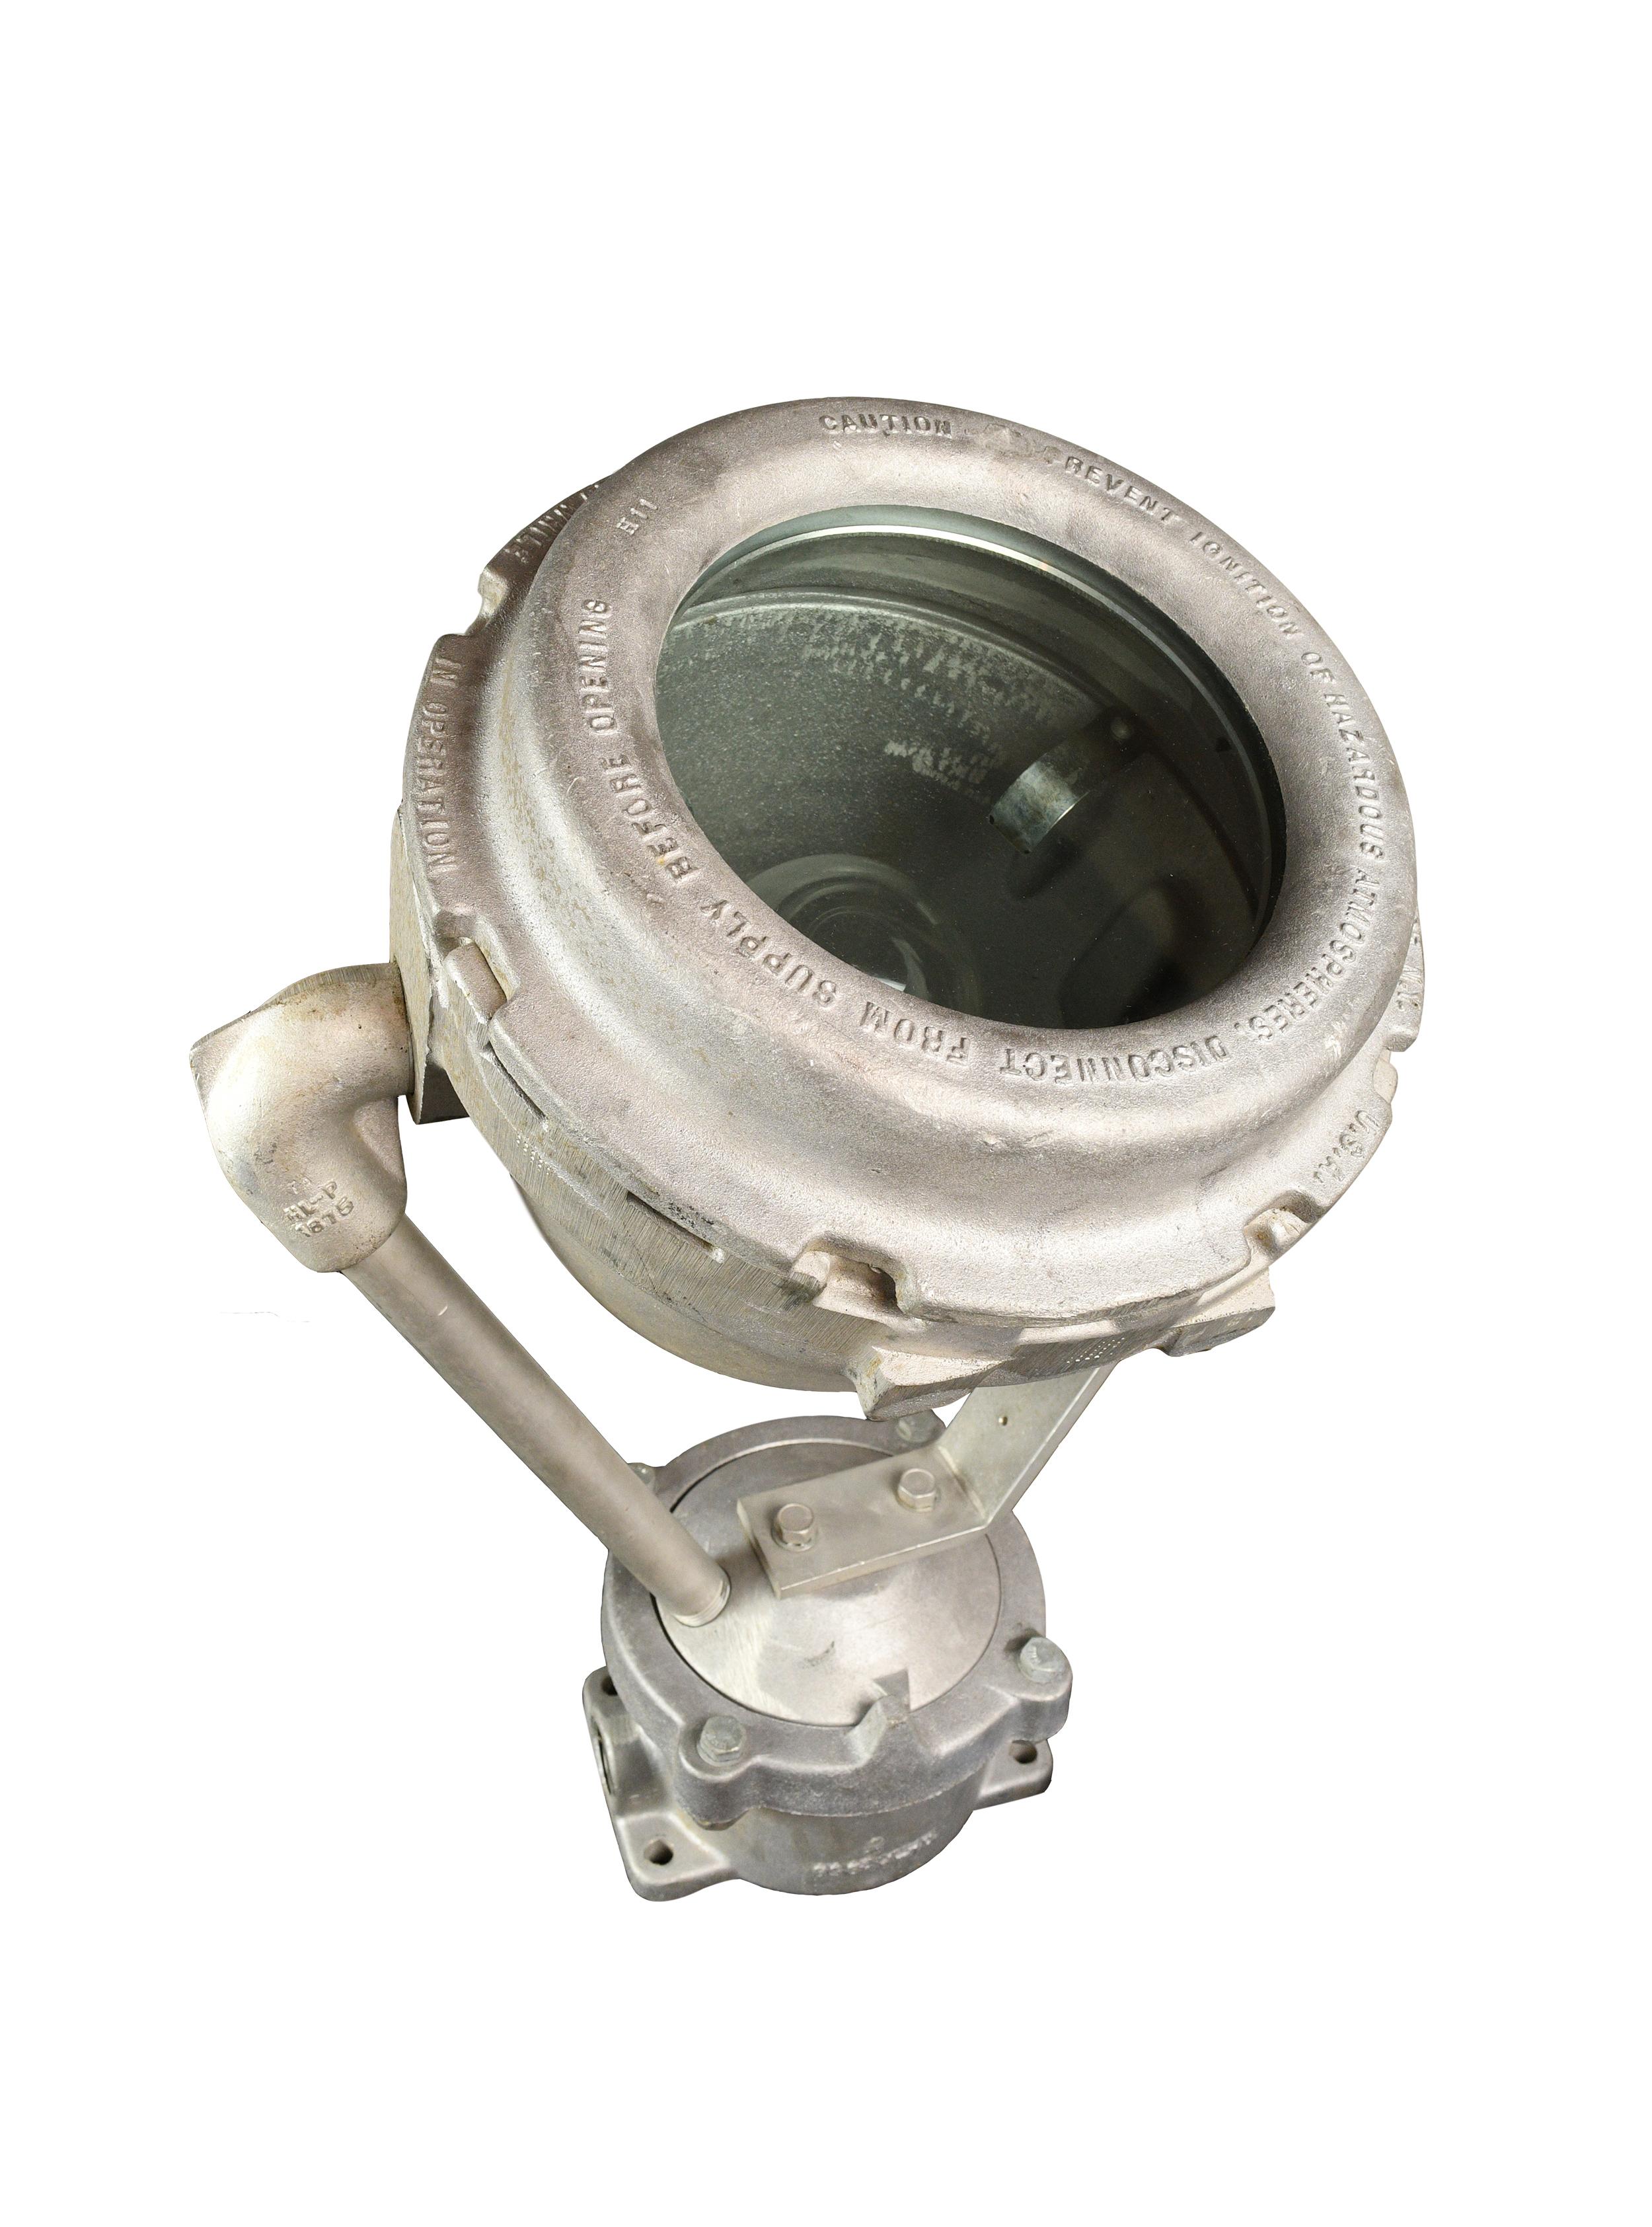 47858-crouse-hinds-spotlight-4.jpg